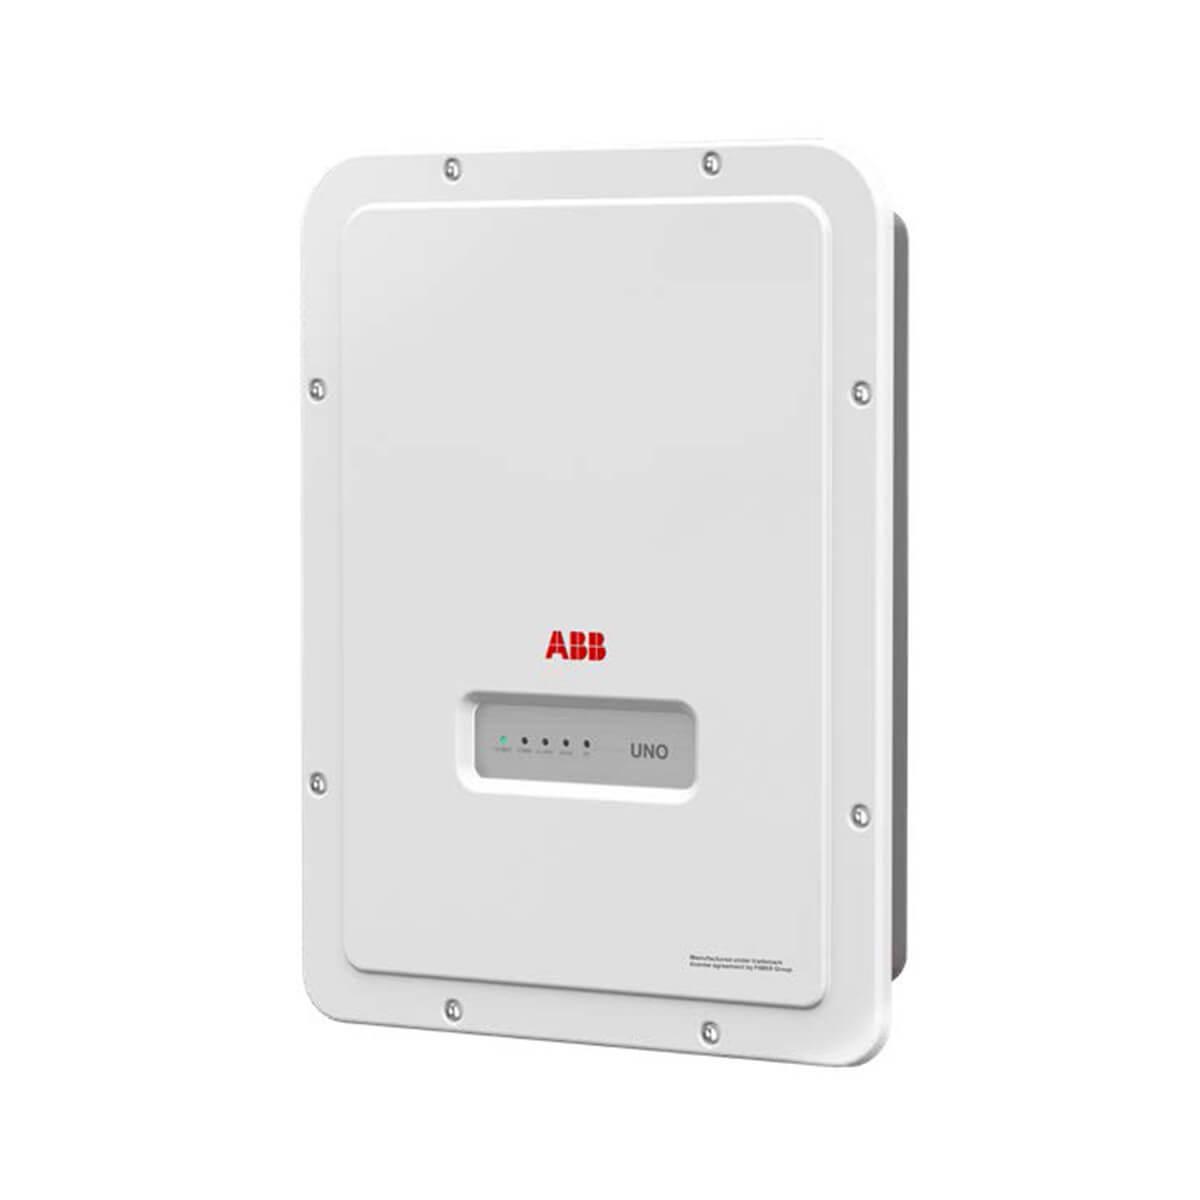 abb fimer 5kW inverter, abb fimer uno-dm 5kW inverter, abb fimer uno-dm-5.0-tl-plus-q inverter, abb fimer uno-dm-5.0-tl-plus-q, abb fimer uno-dm 5 kW, ABB FIMER 5 KW